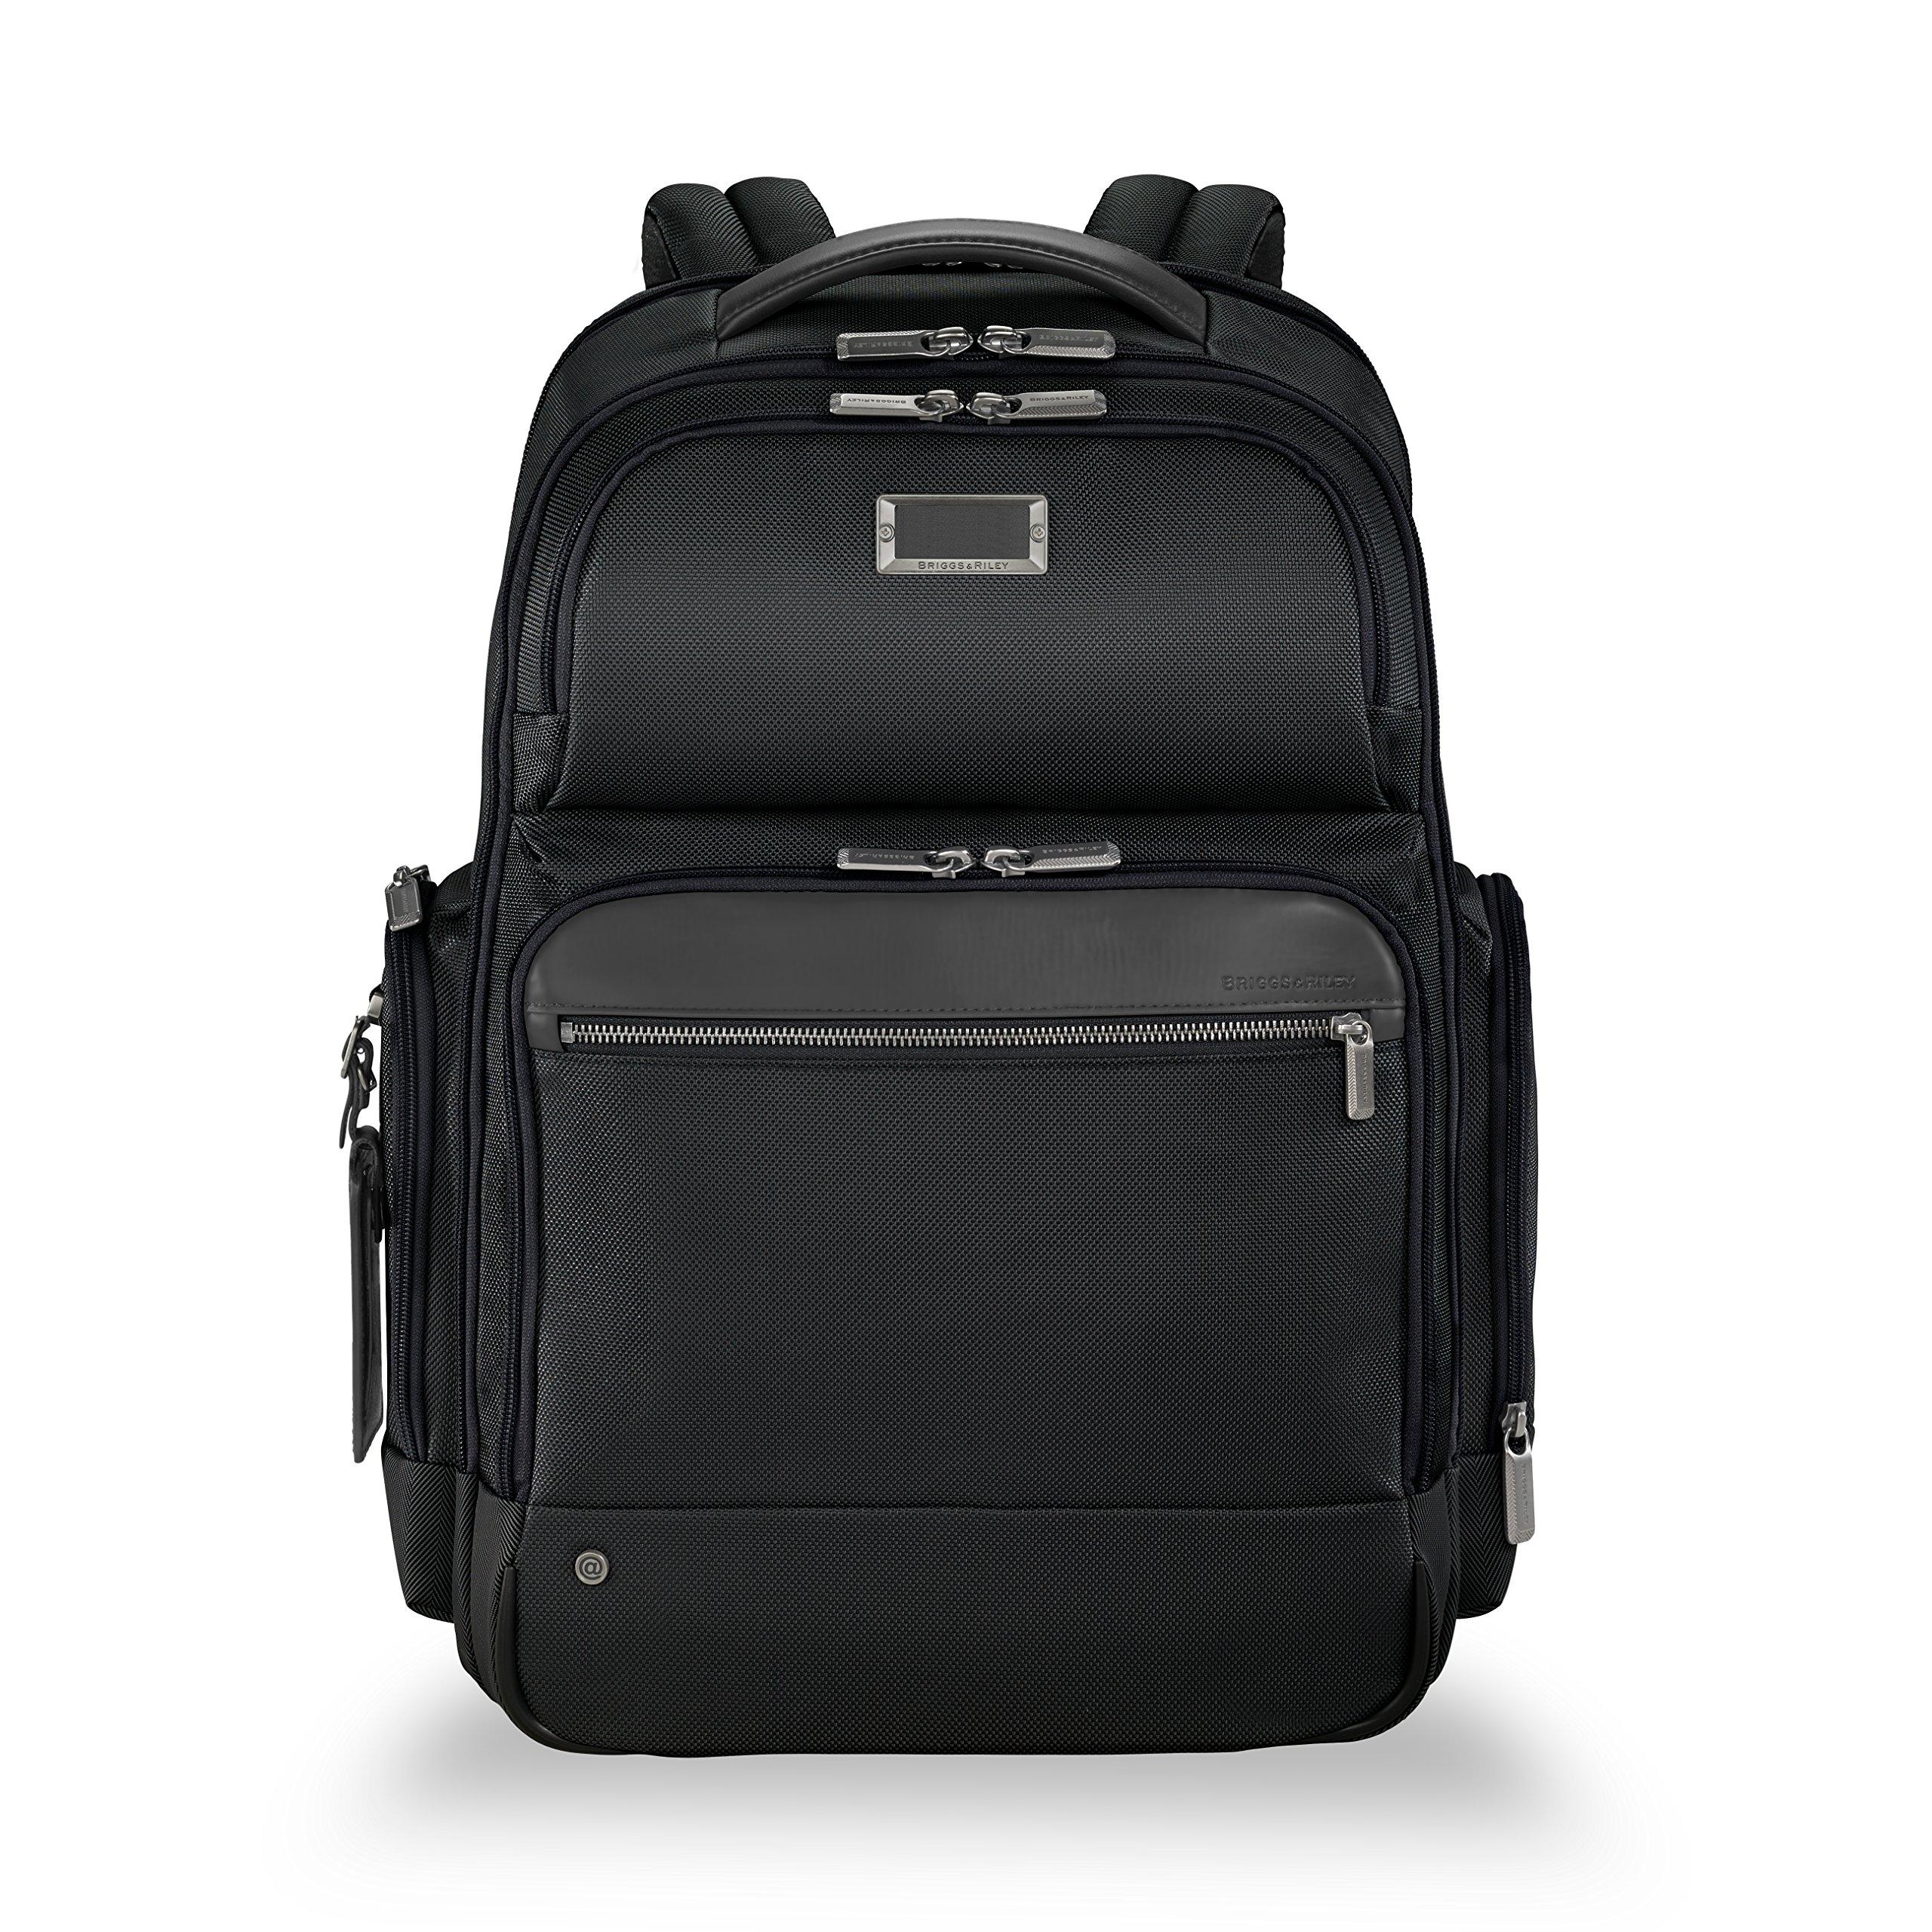 Briggs & Riley @work Large Cargo Laptop Backpack, Black